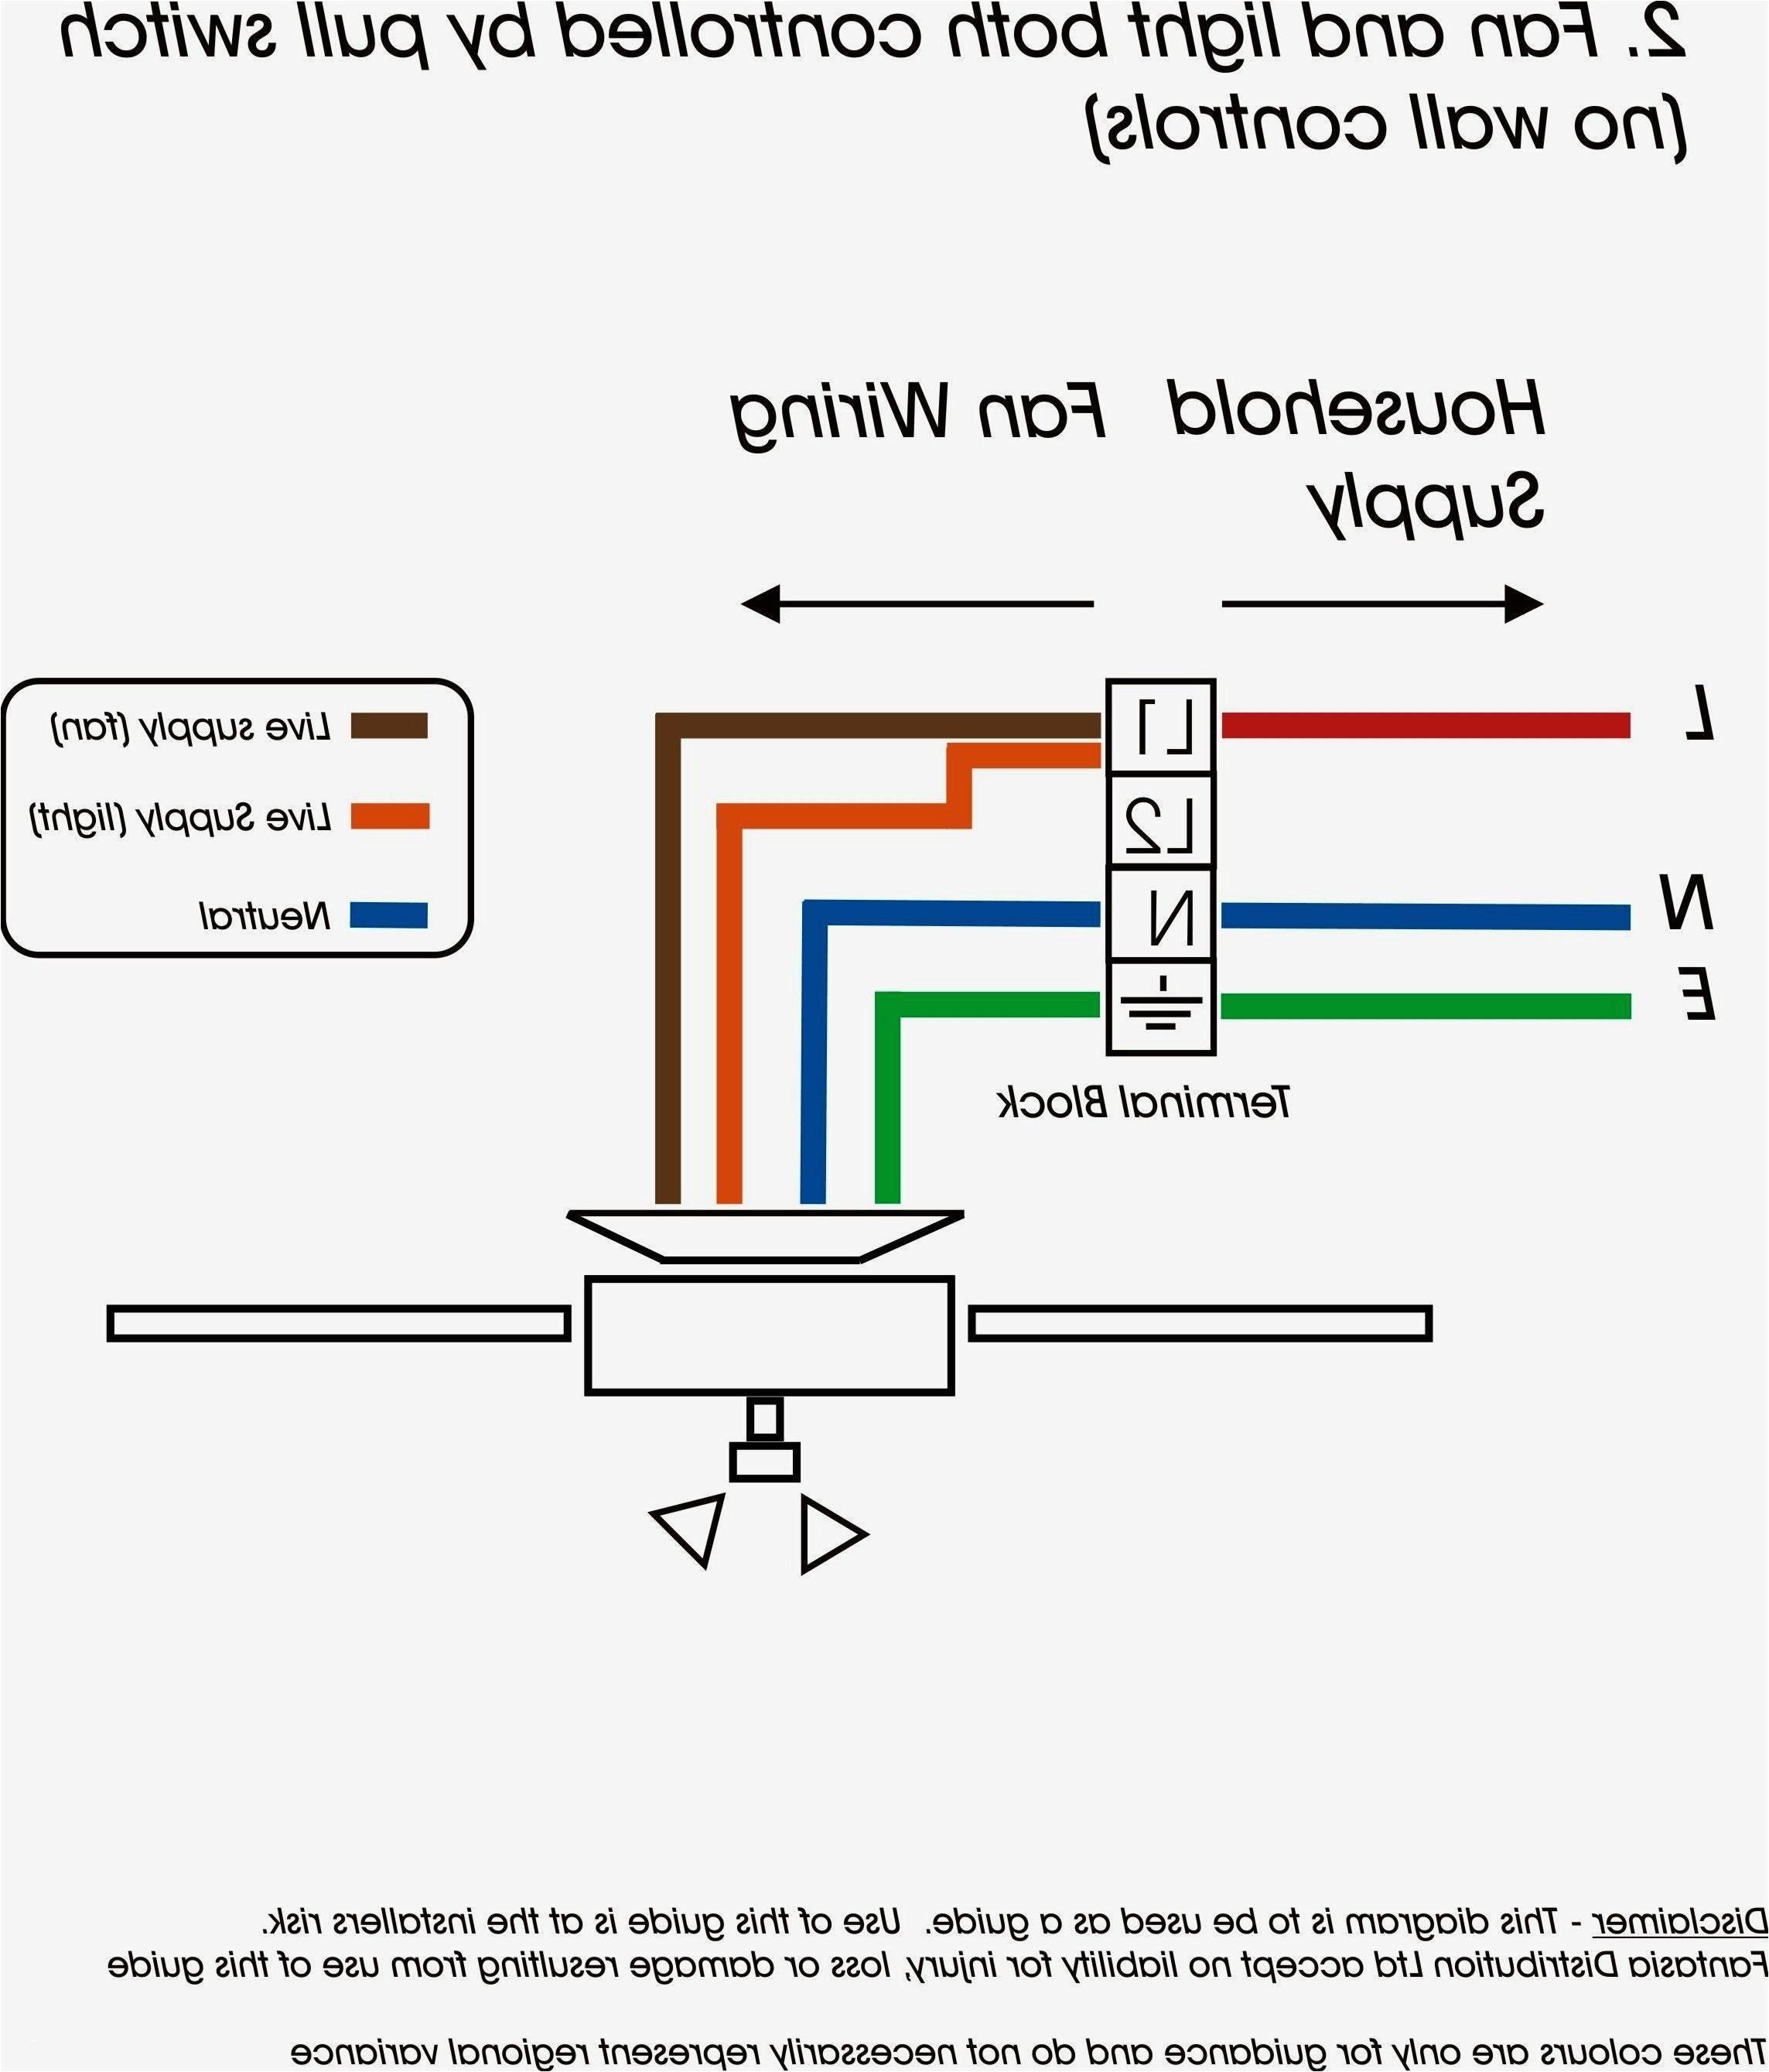 440 Volt 3 Phase Wiring Diagram 20amp 3 Phase Plug Wiring Diagram Schema Diagram Database